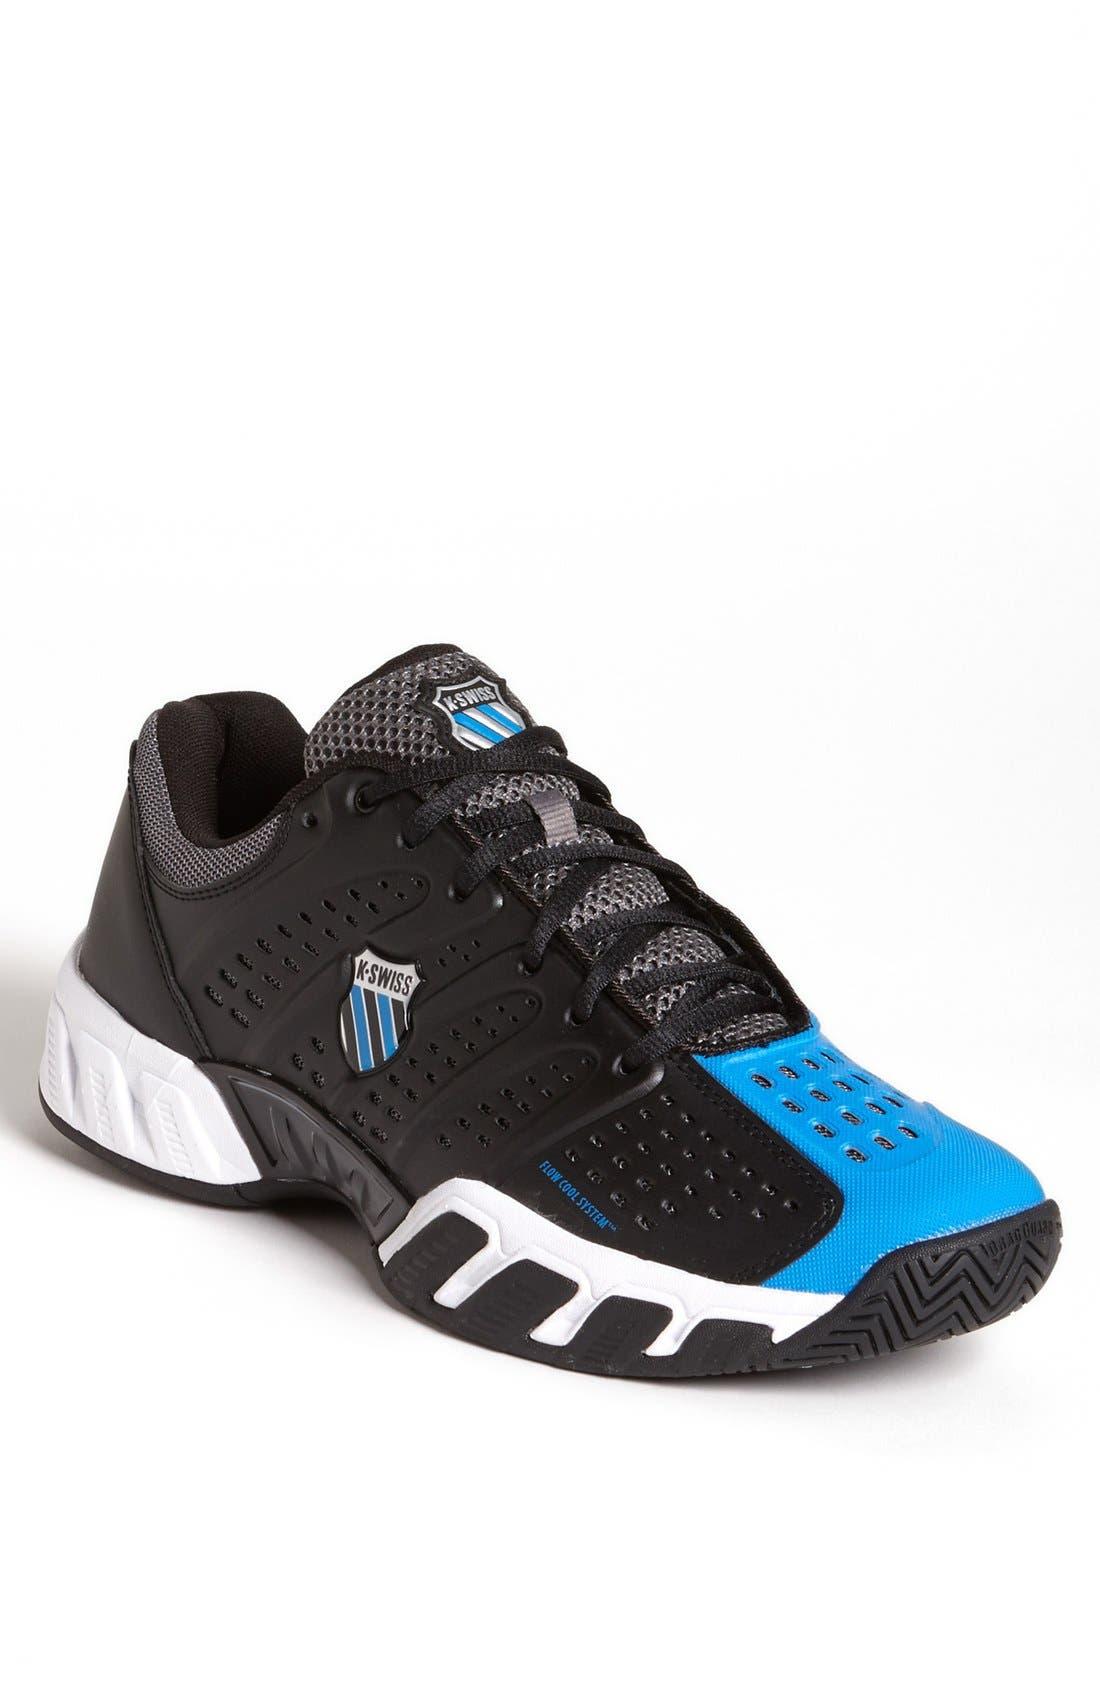 Main Image - K-Swiss 'Big Shot Light' Tennis Shoe (Men)